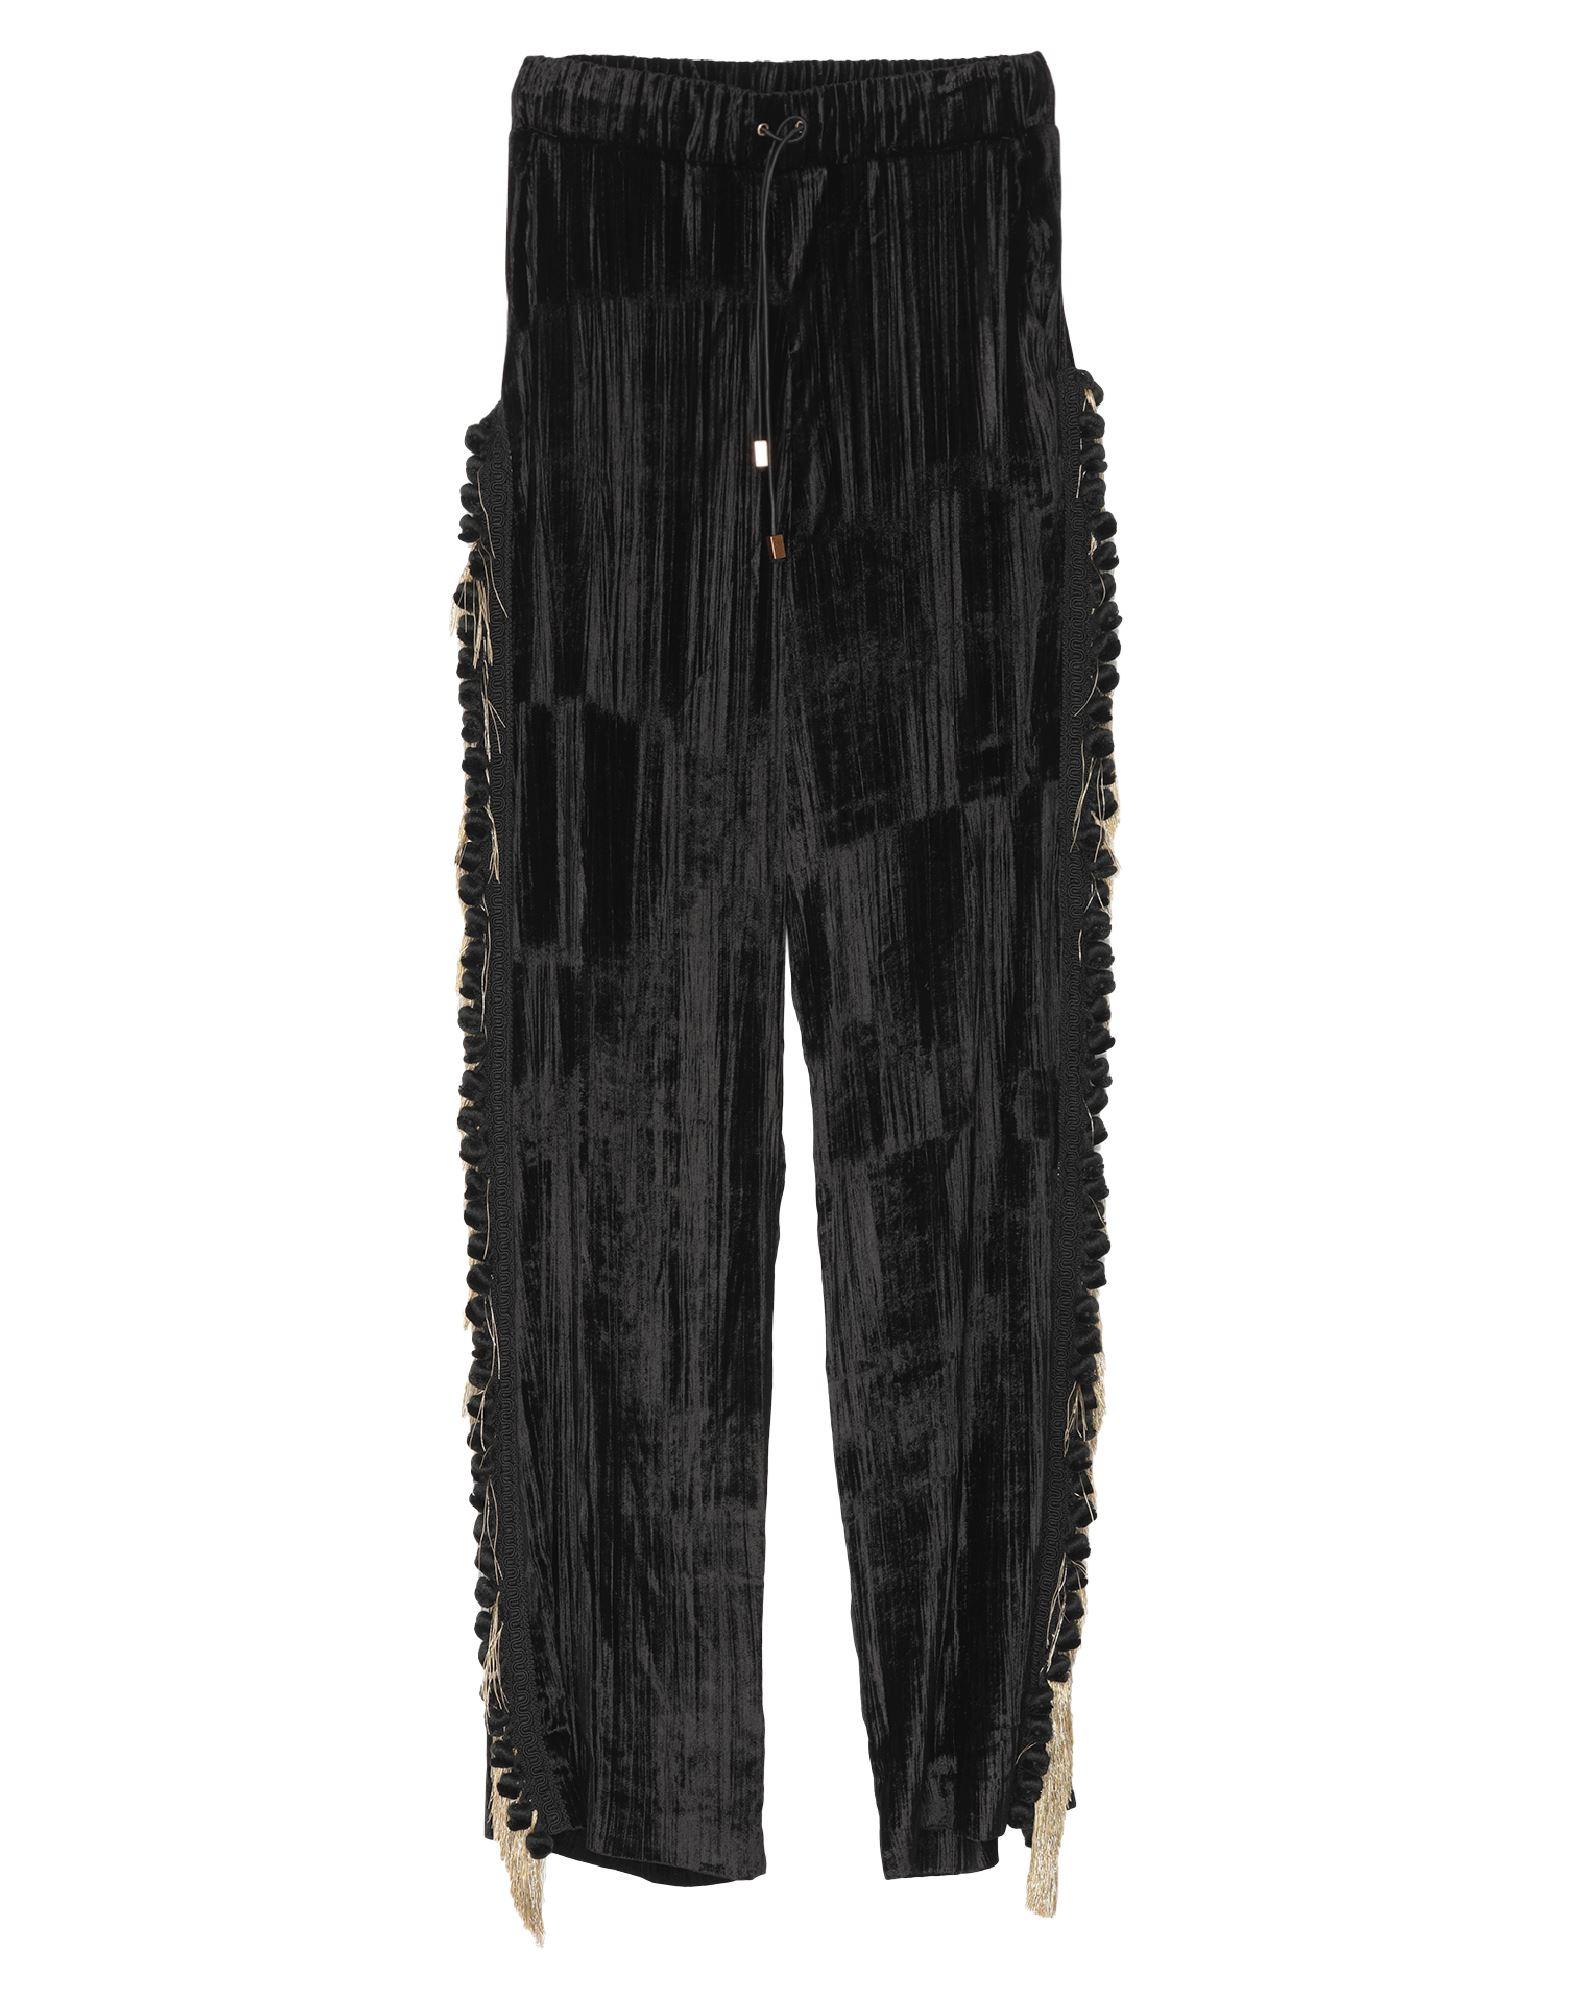 Фото - FAUSTO PUGLISI Повседневные брюки fausto puglisi пиджак